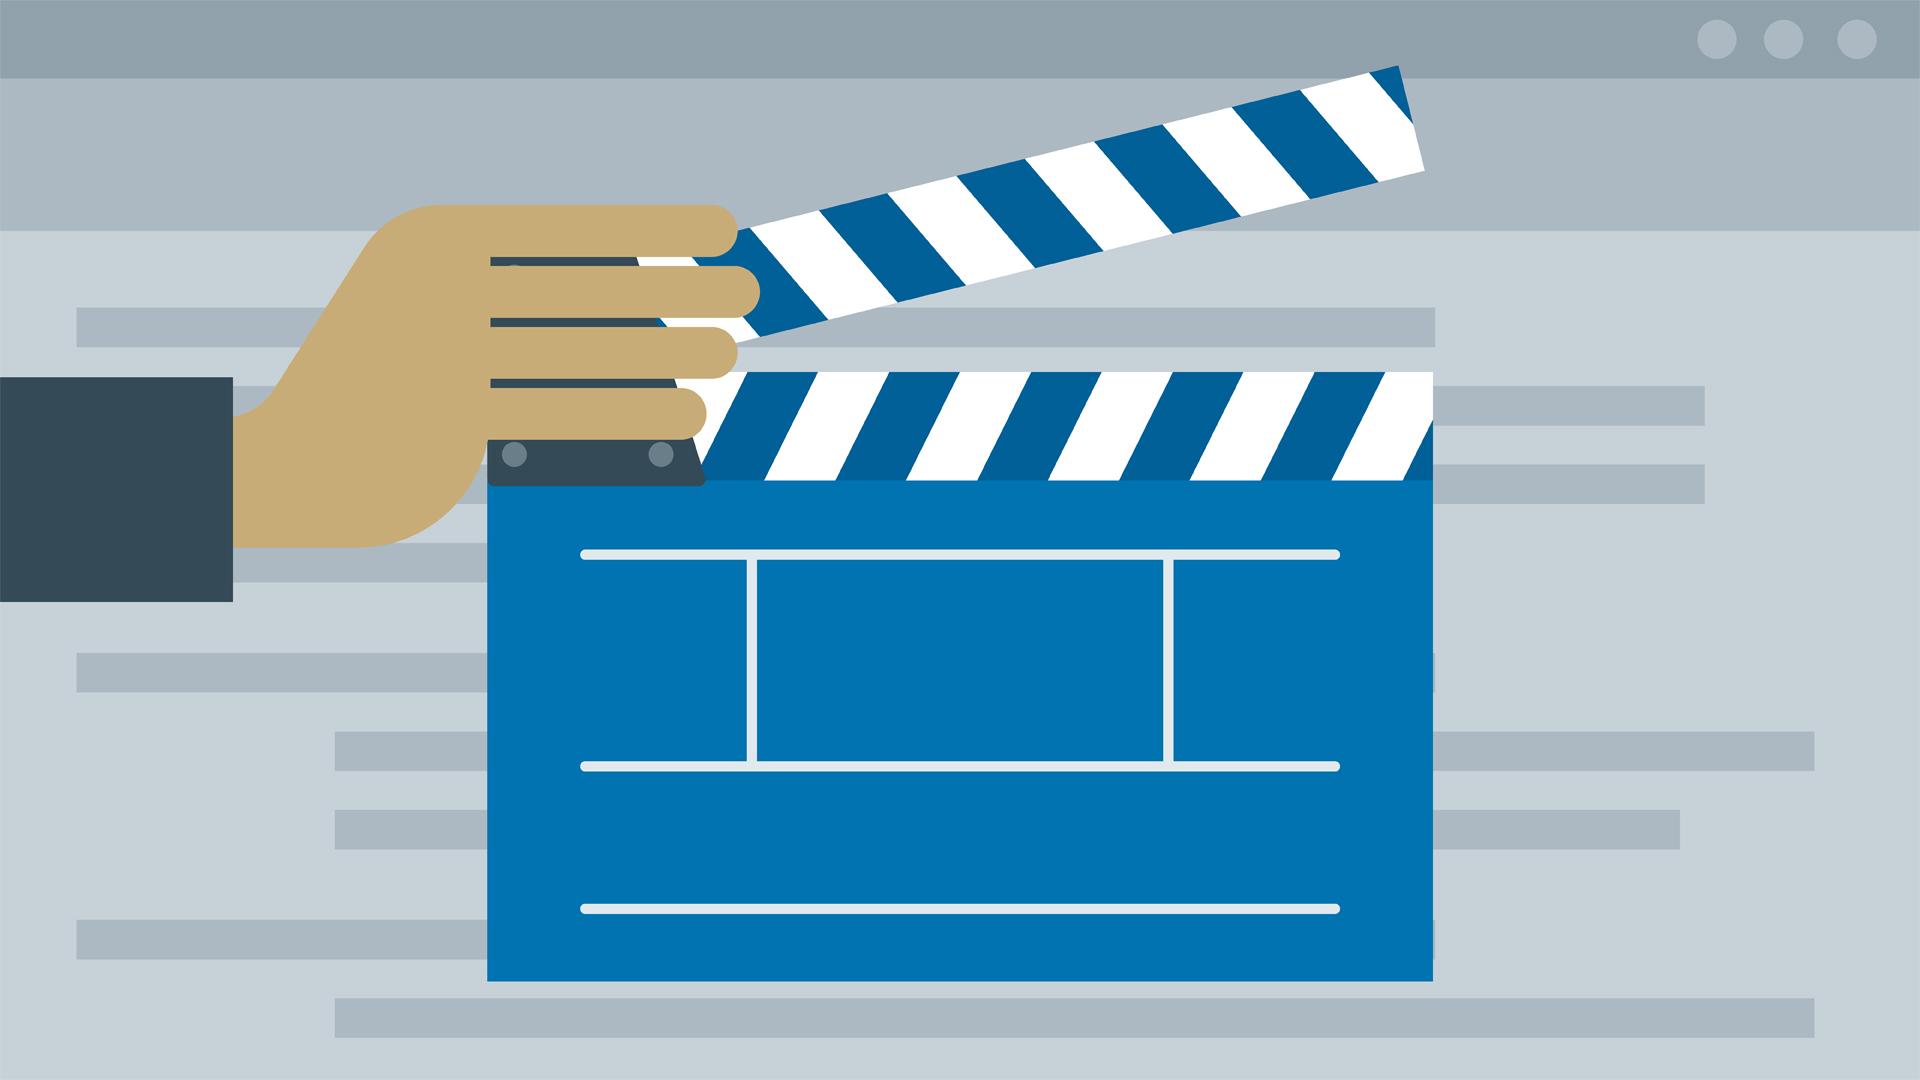 Illustration of a film clapboard